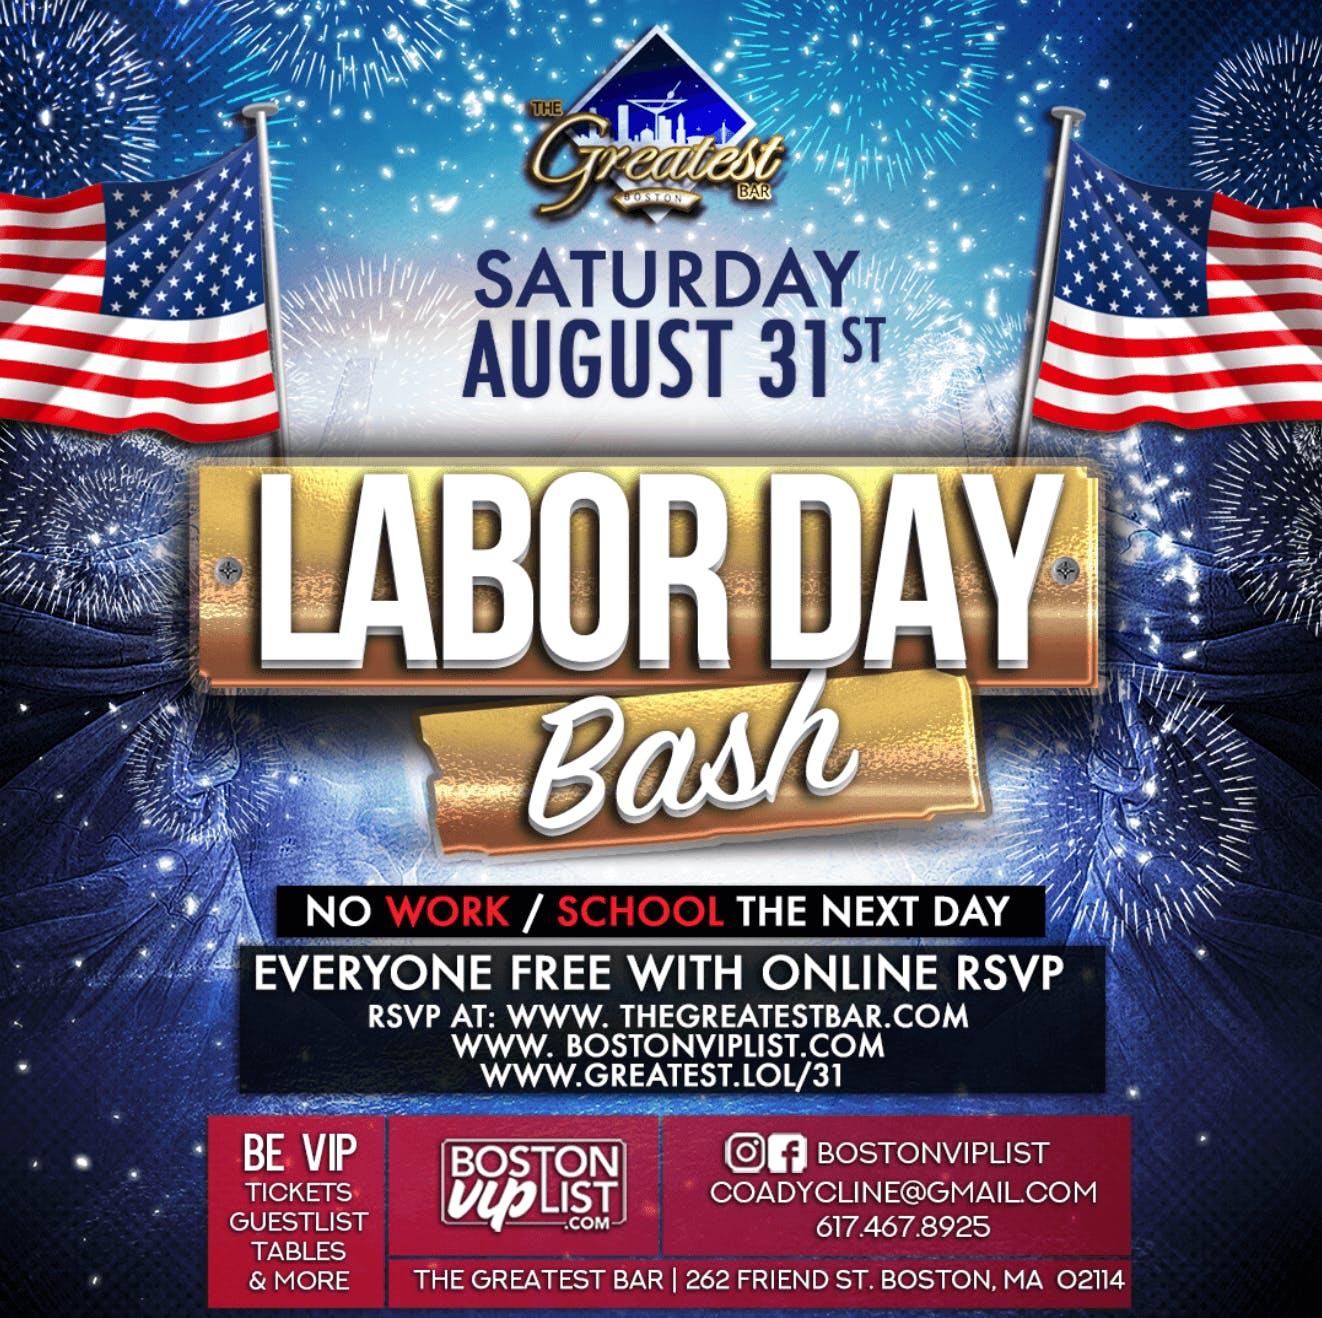 Labor Day Bash @ The Greatest Bar, Boston MA - Aug 31 ...